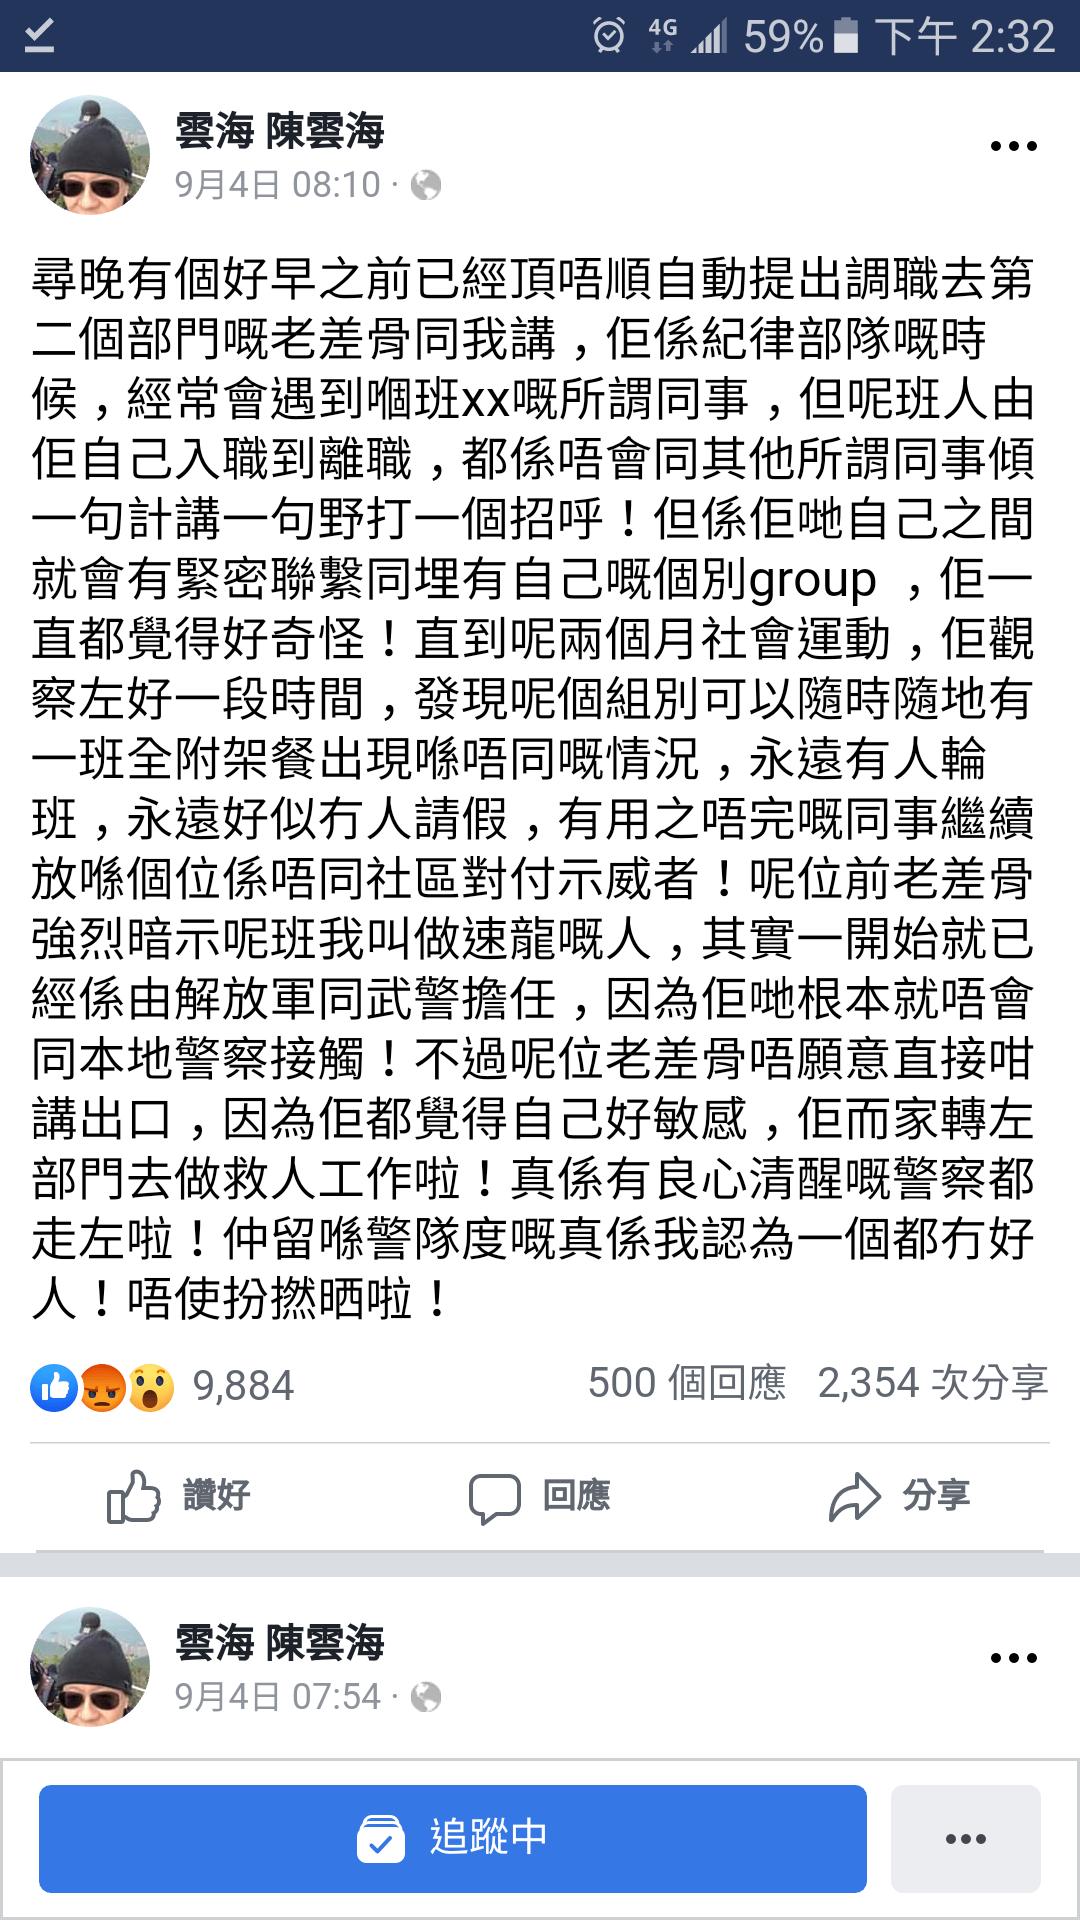 https://upload.cc/i1/2019/09/10/jeN2Dn.png